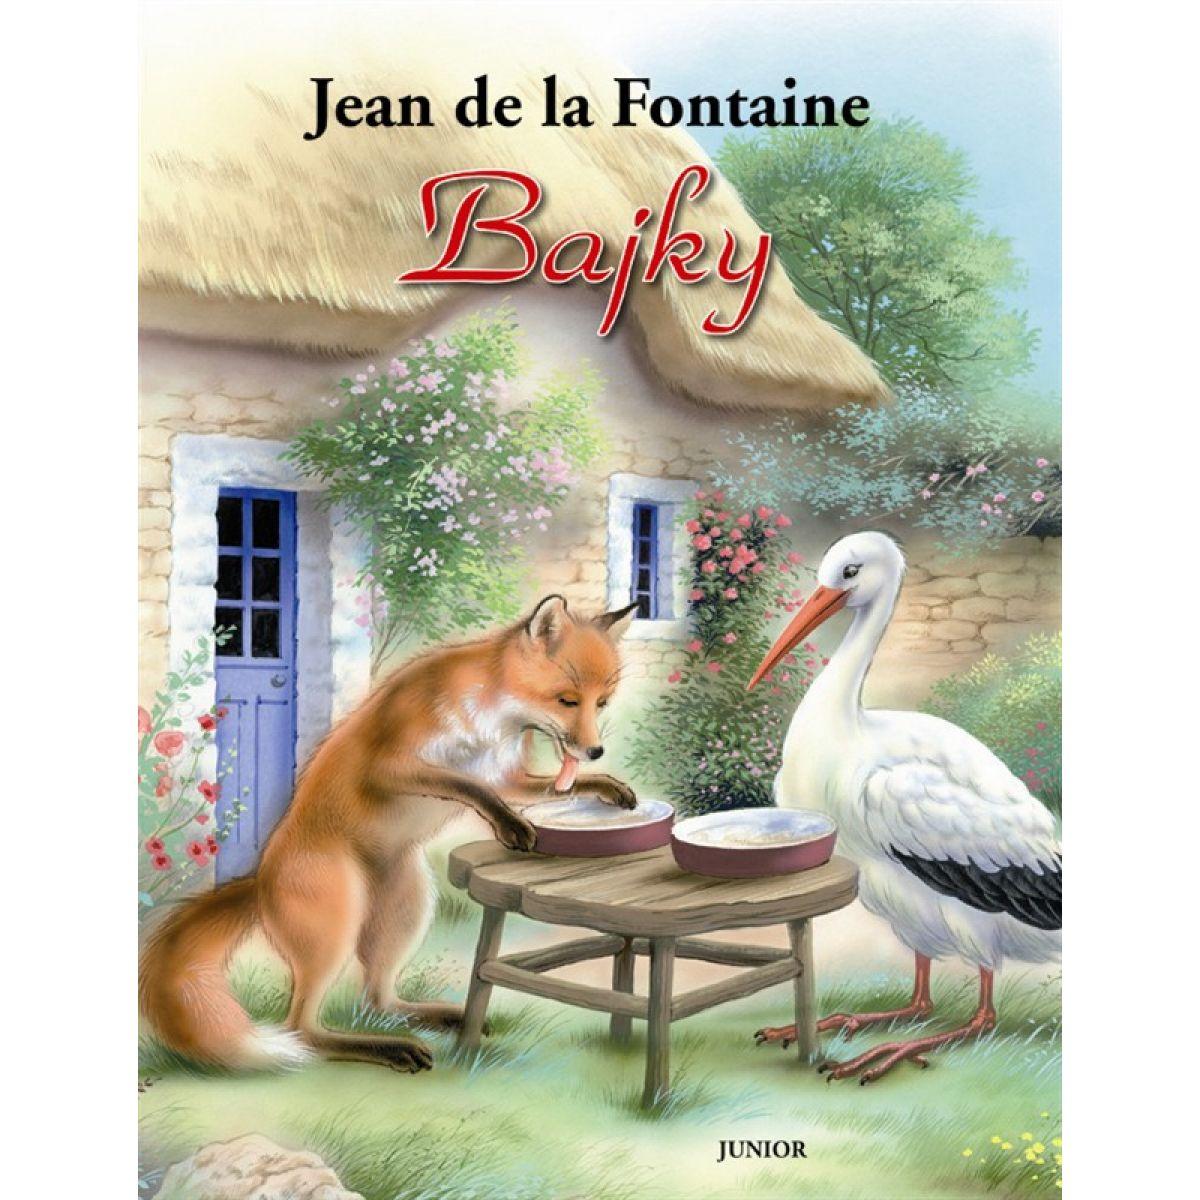 Bajky - La Fontaine, Jean de (Junior 0088873)